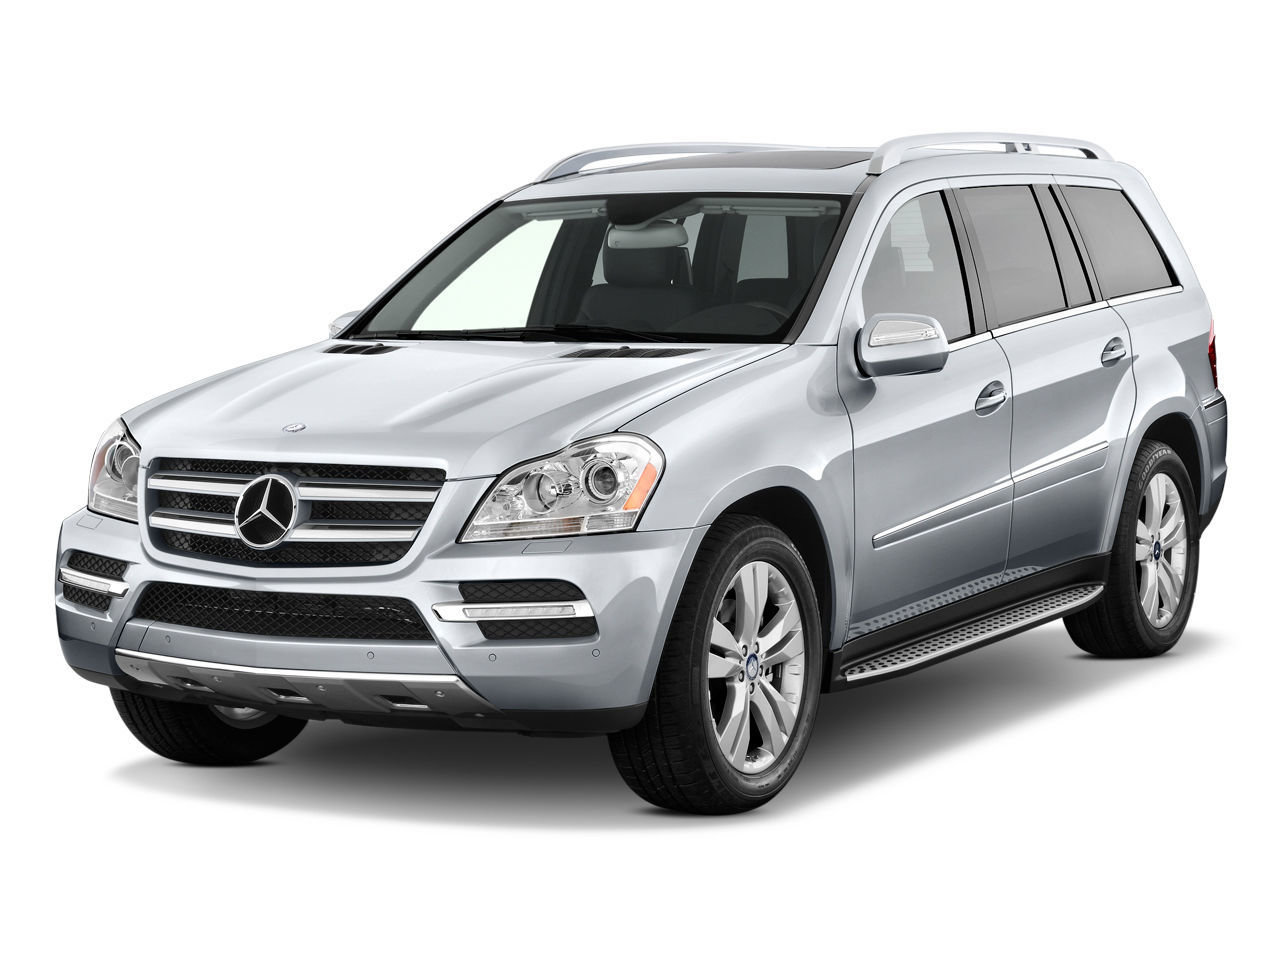 Mercedes GL350CDI X164 EDC17CP10 1037516337 6429032203